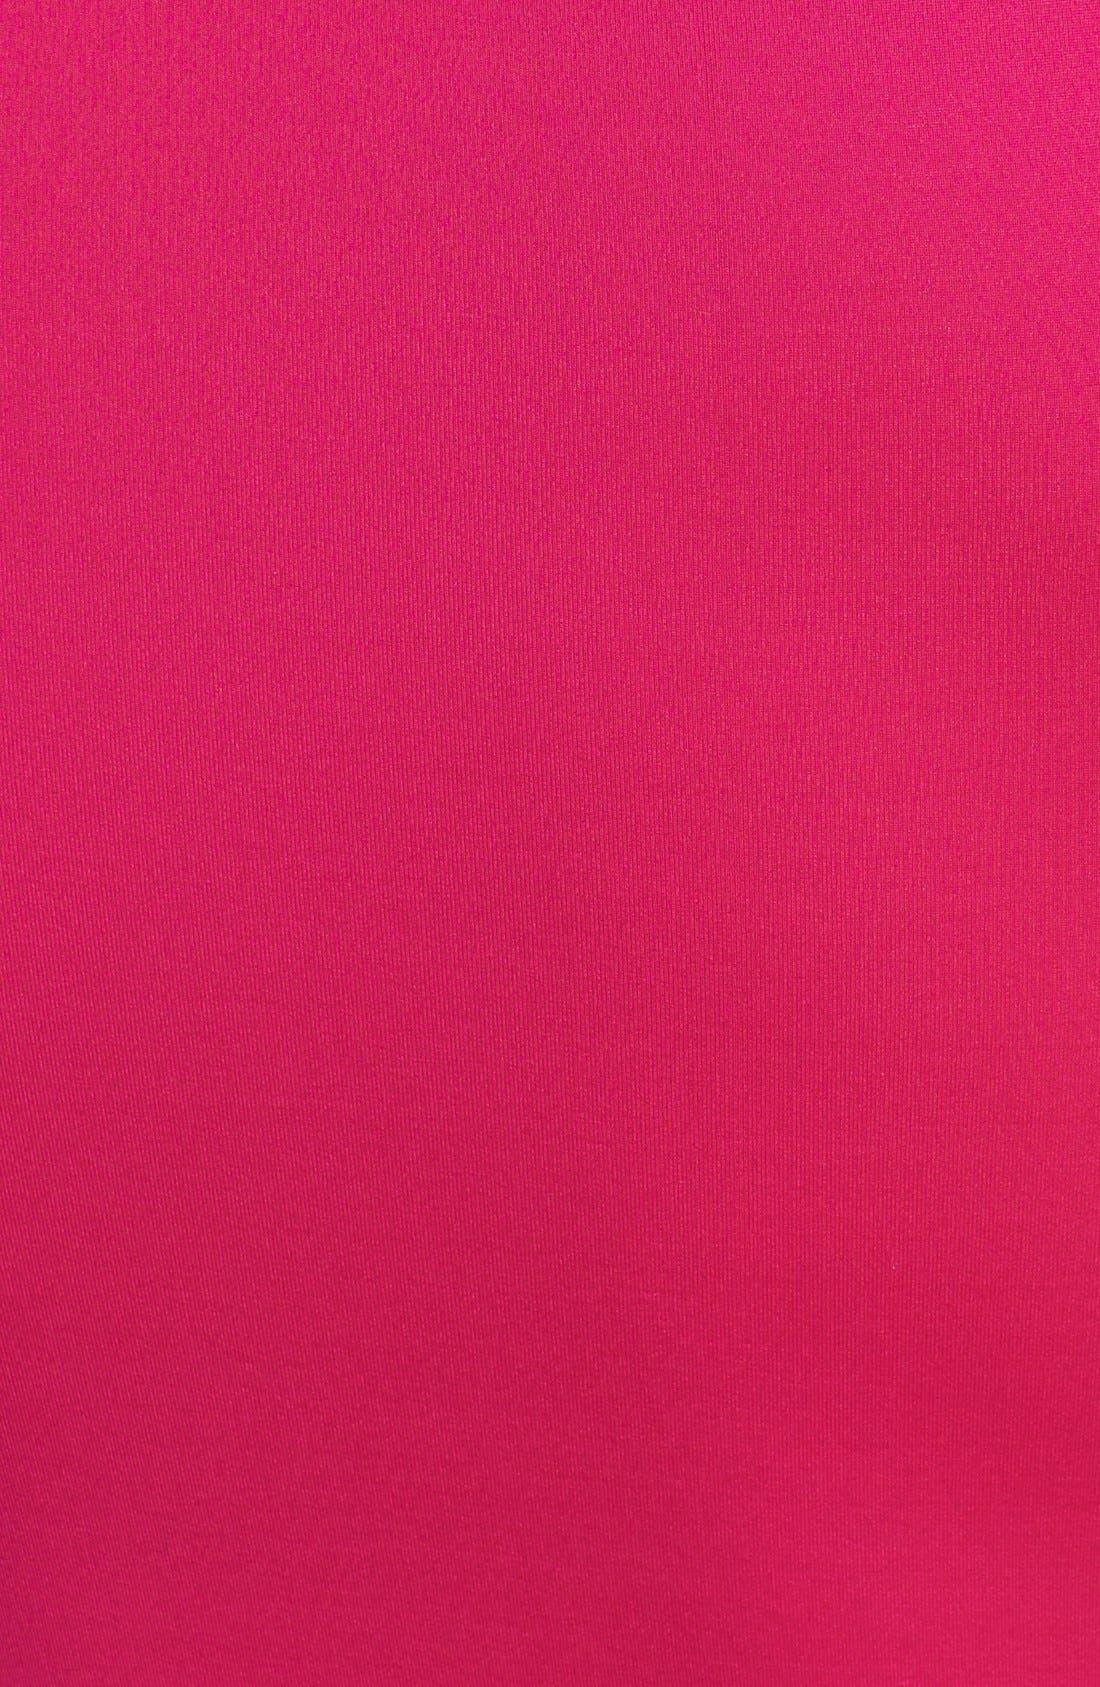 Alternate Image 3  - W Swimwear 'Pink Palms' Rashguard